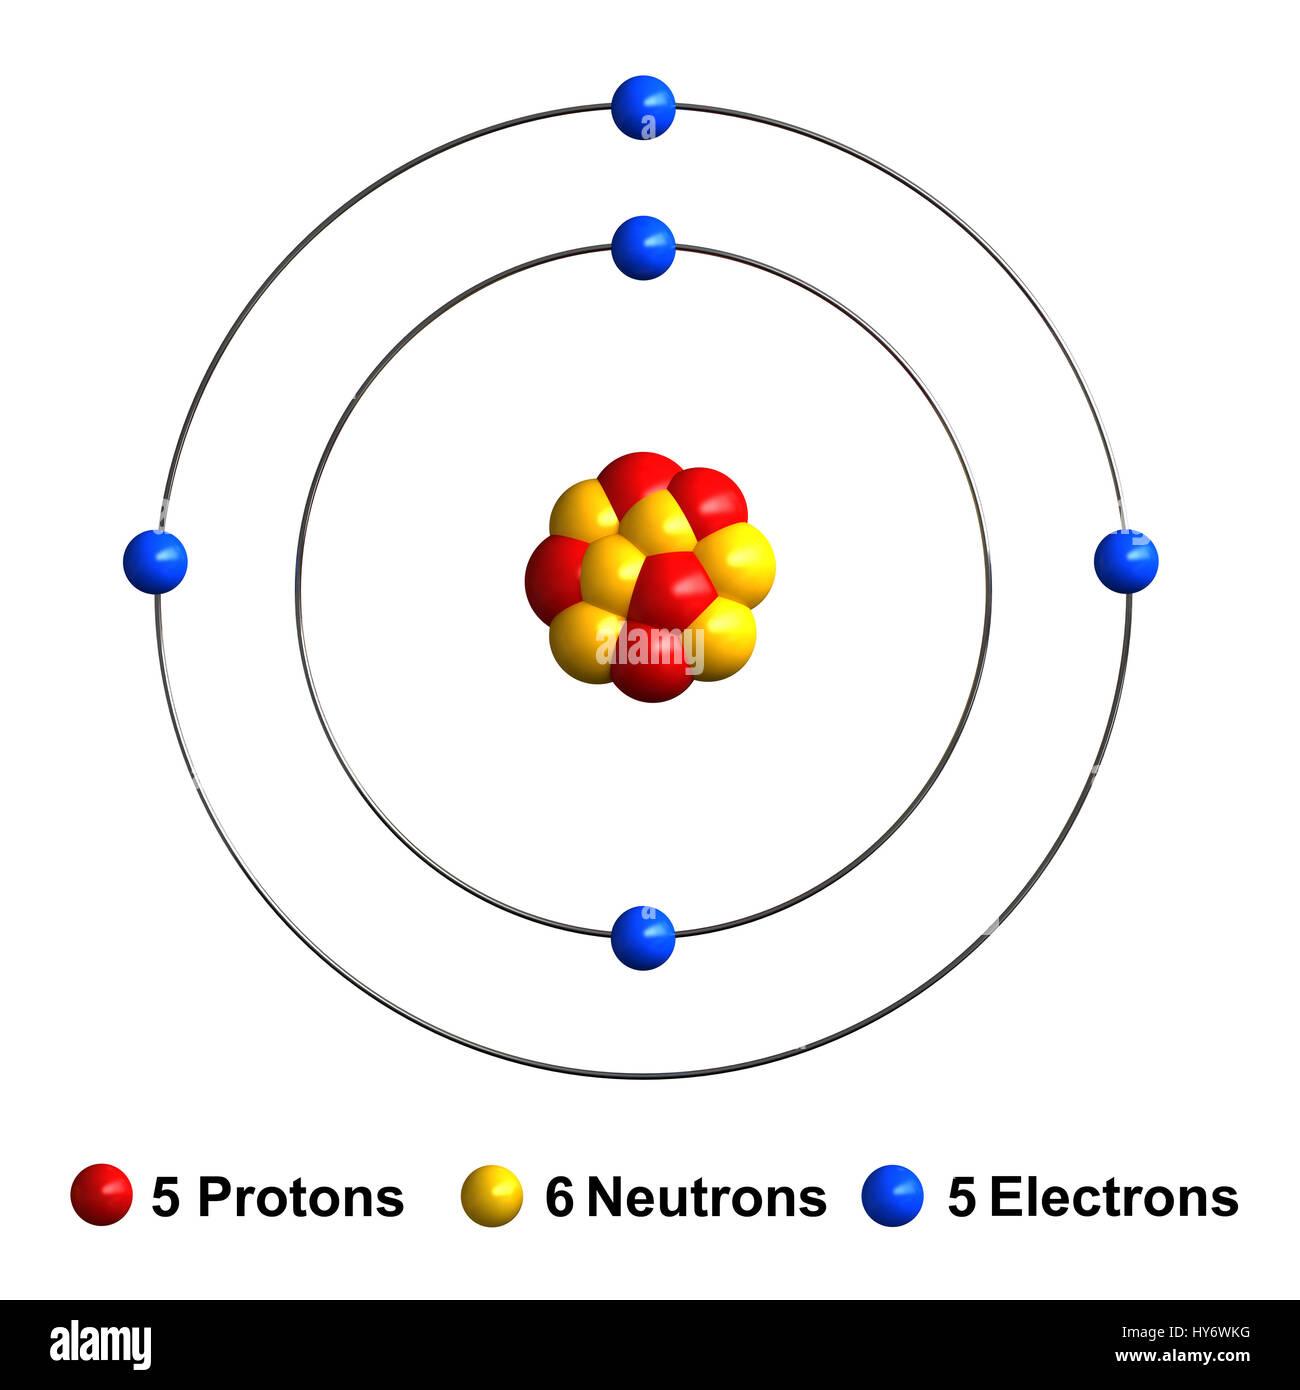 boron diagram atom expert wiring diagram u2022 rh heathersmith co boron diagram for aluminum boron diagram for aluminum